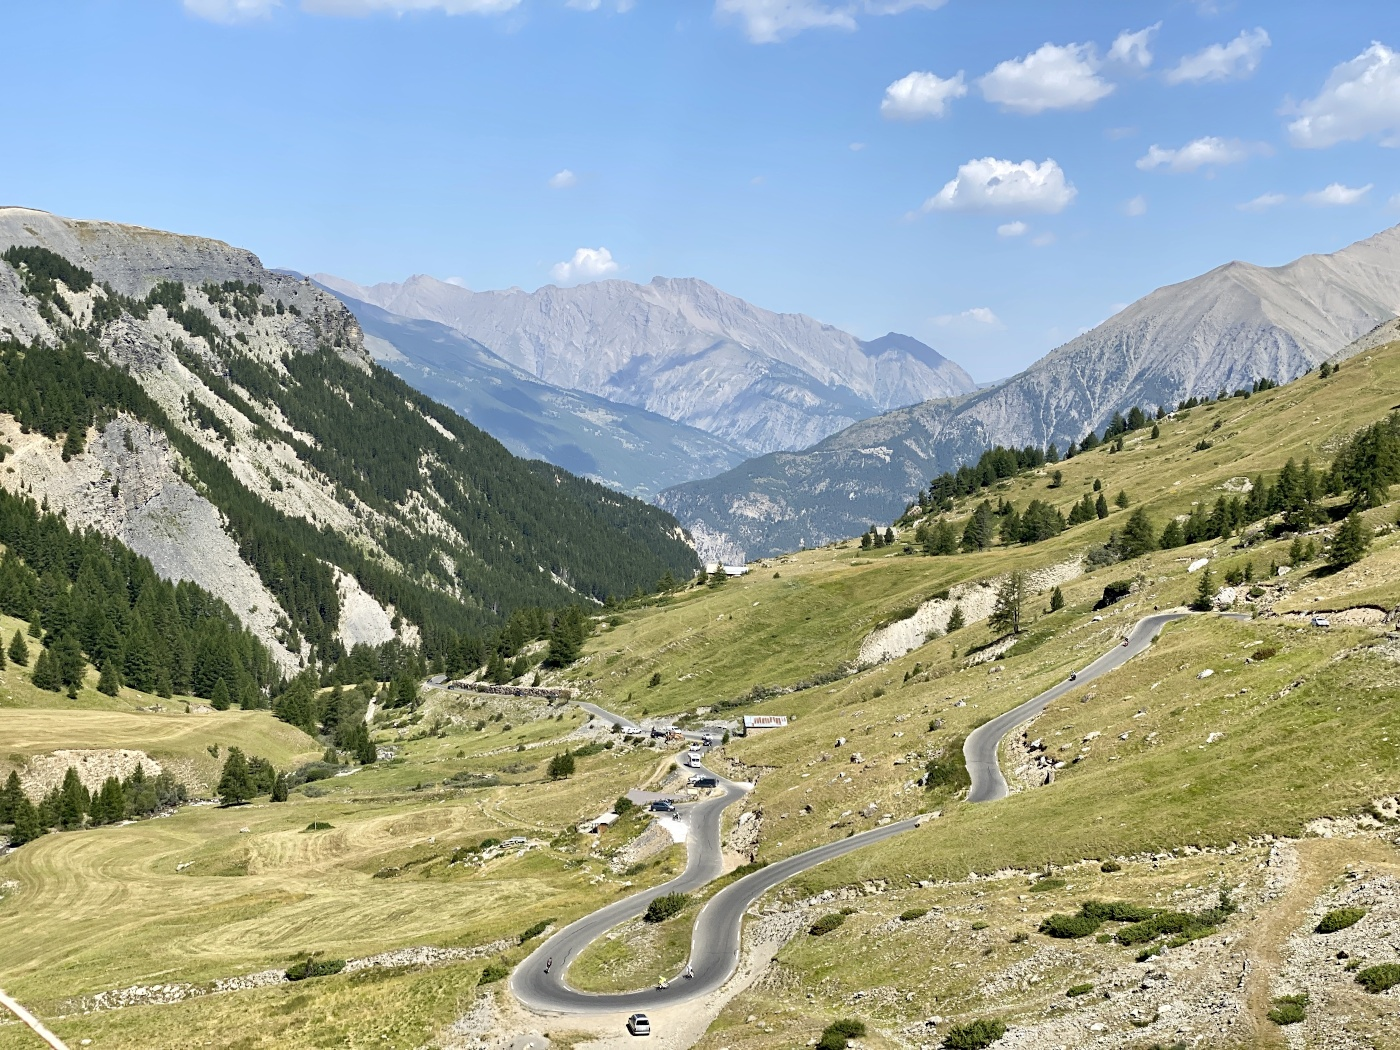 Patascha Bonette Col Route de la Roadtrip Route des Grandes Alpes Camping Wohnmobil Camper Europa Frankreich